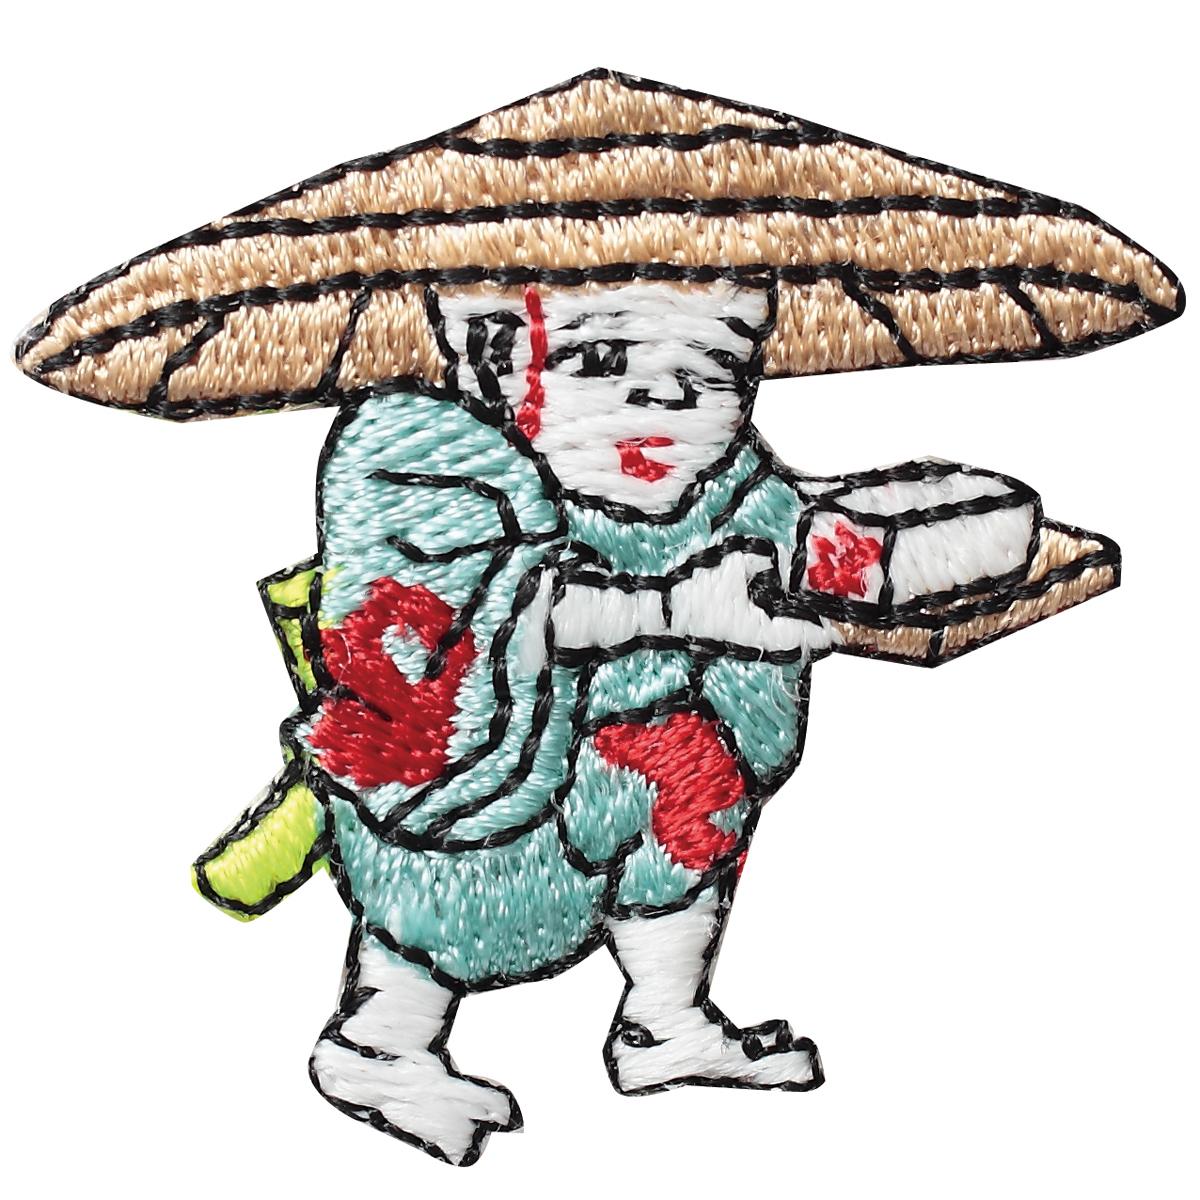 KYWS-195/ワッペン/豆腐小僧/とうふこぞう/【DM便可】